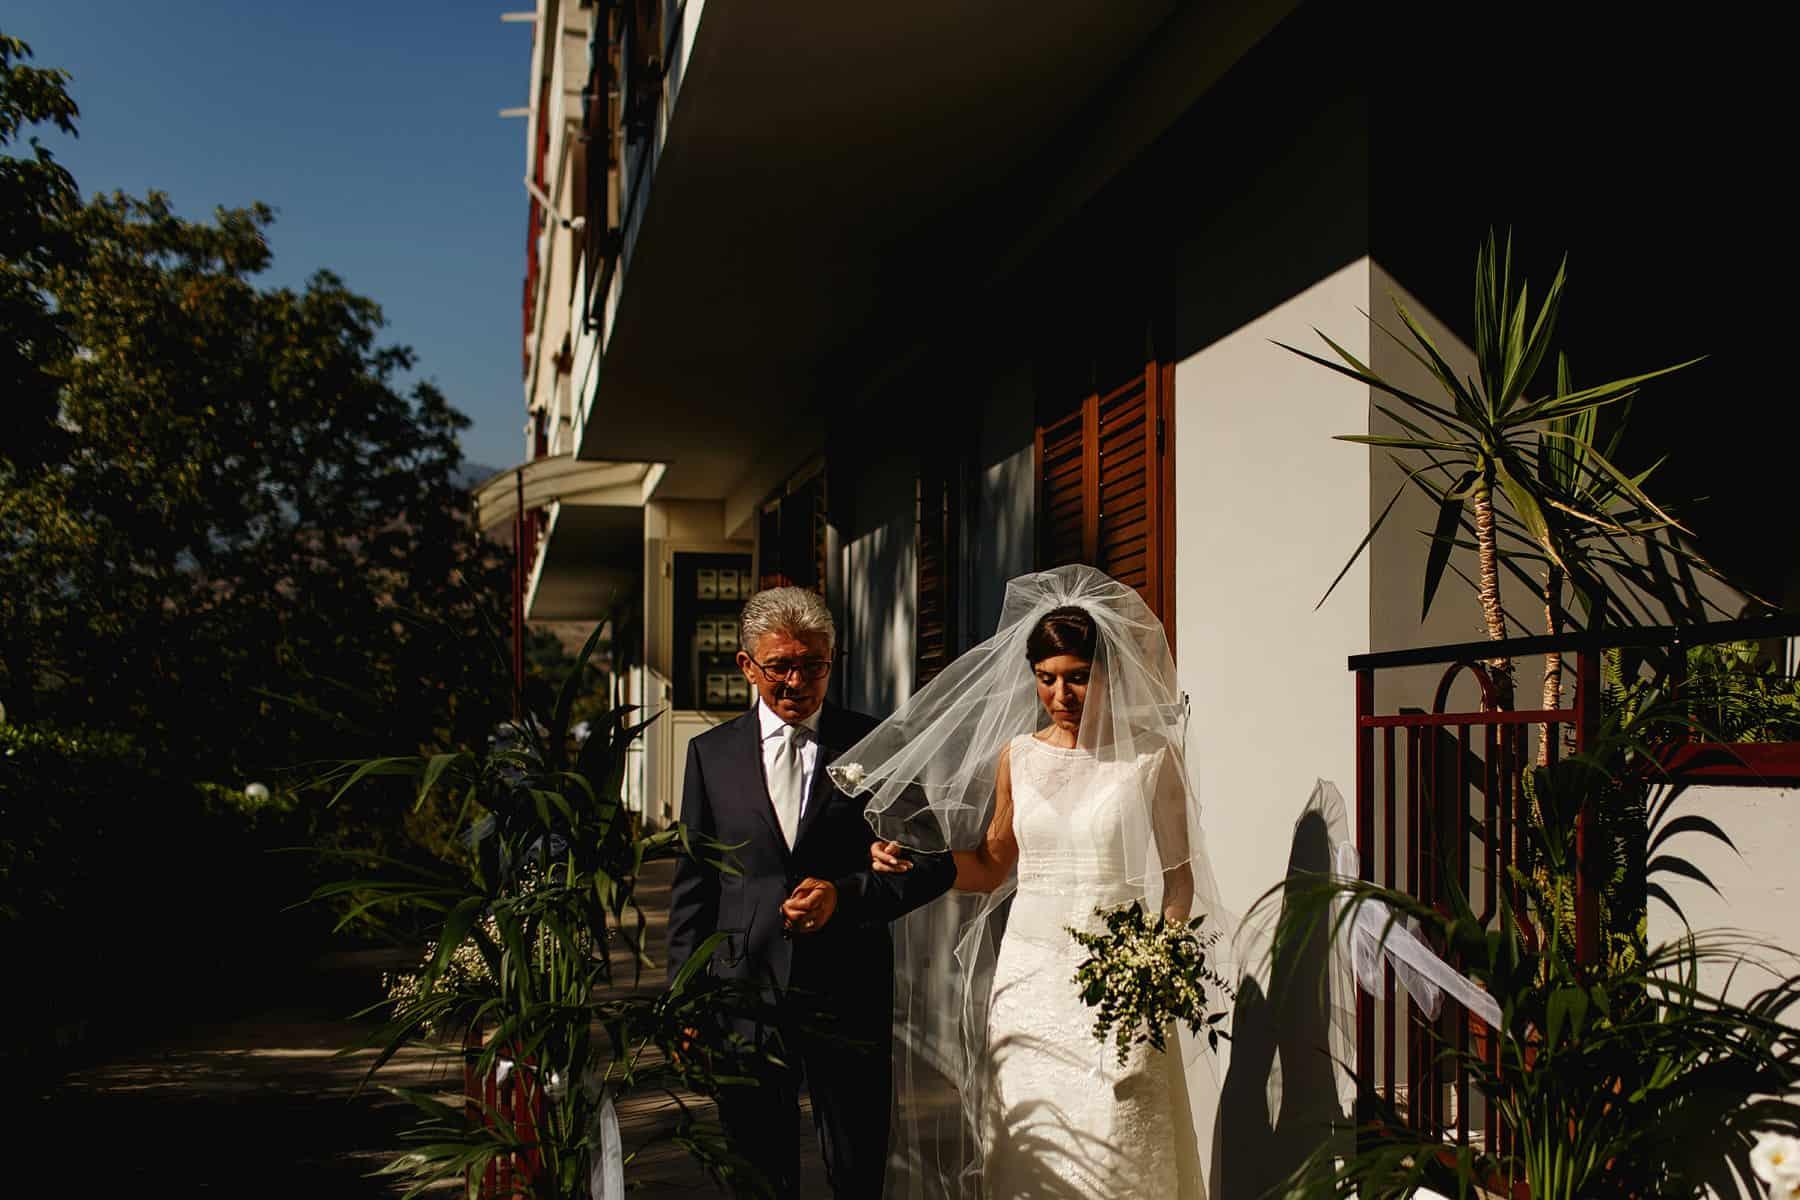 paestum italy wedding